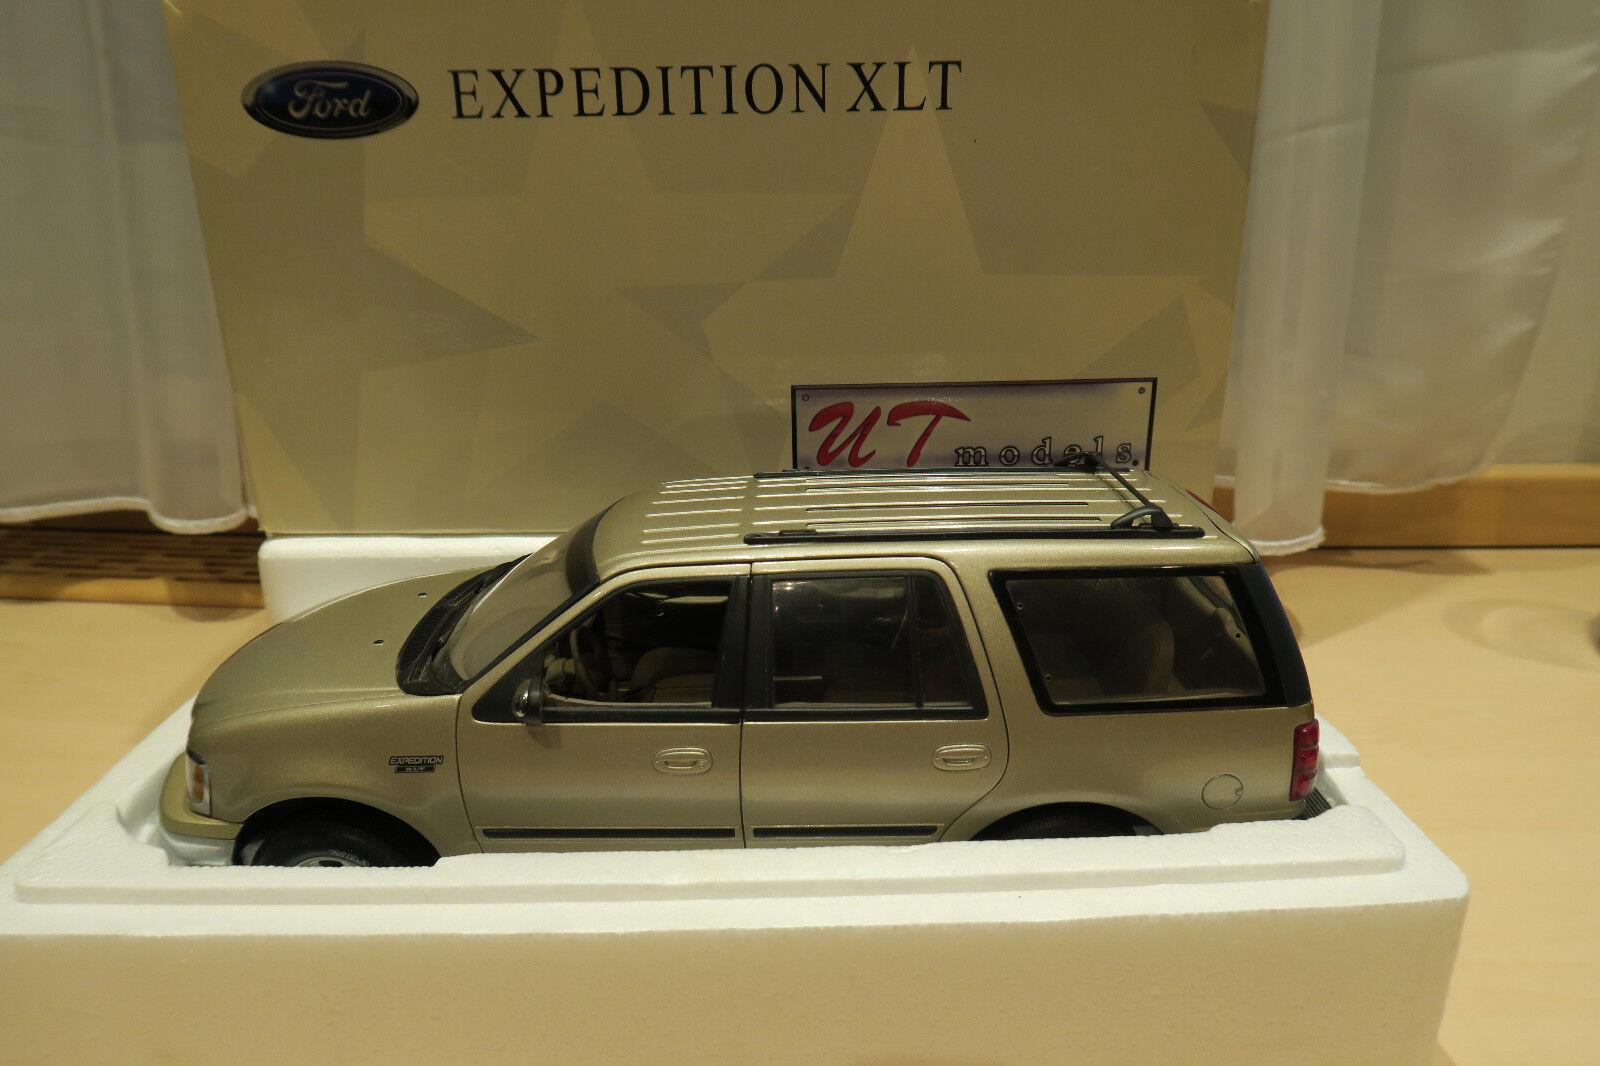 Ford Expedition XLT UT Models 1 18 met. Gold